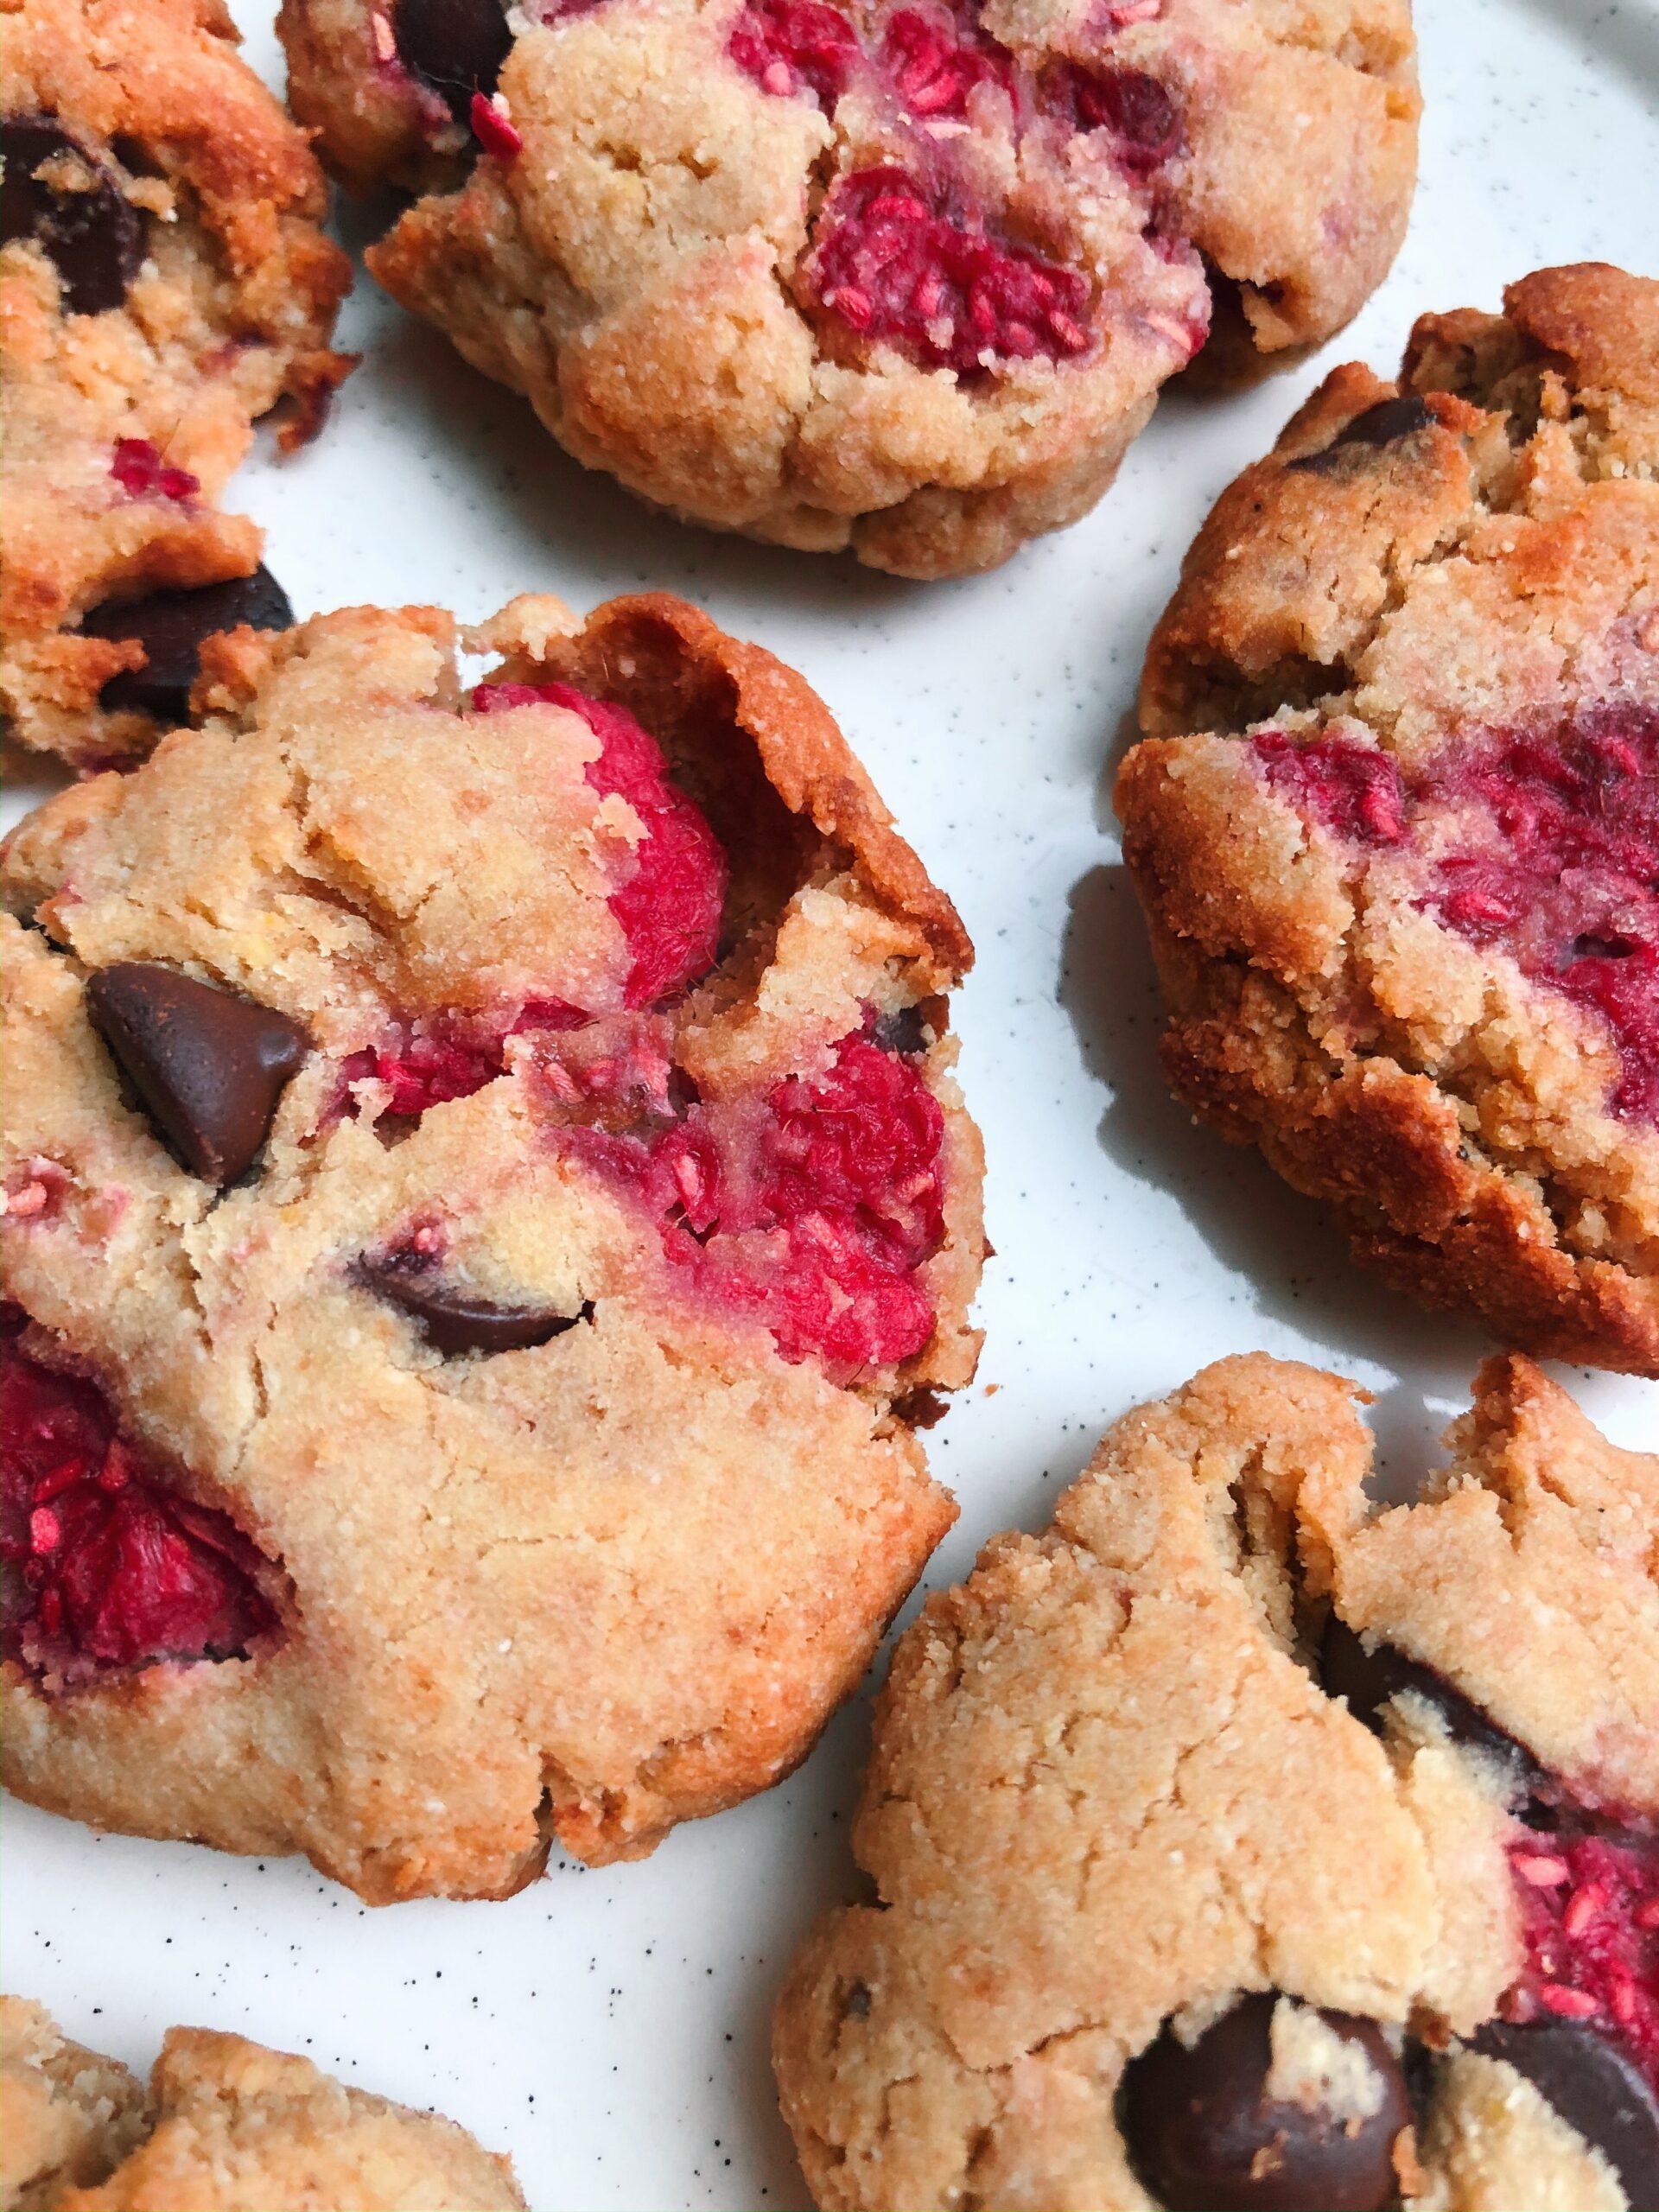 Raspberry chocolate cookies